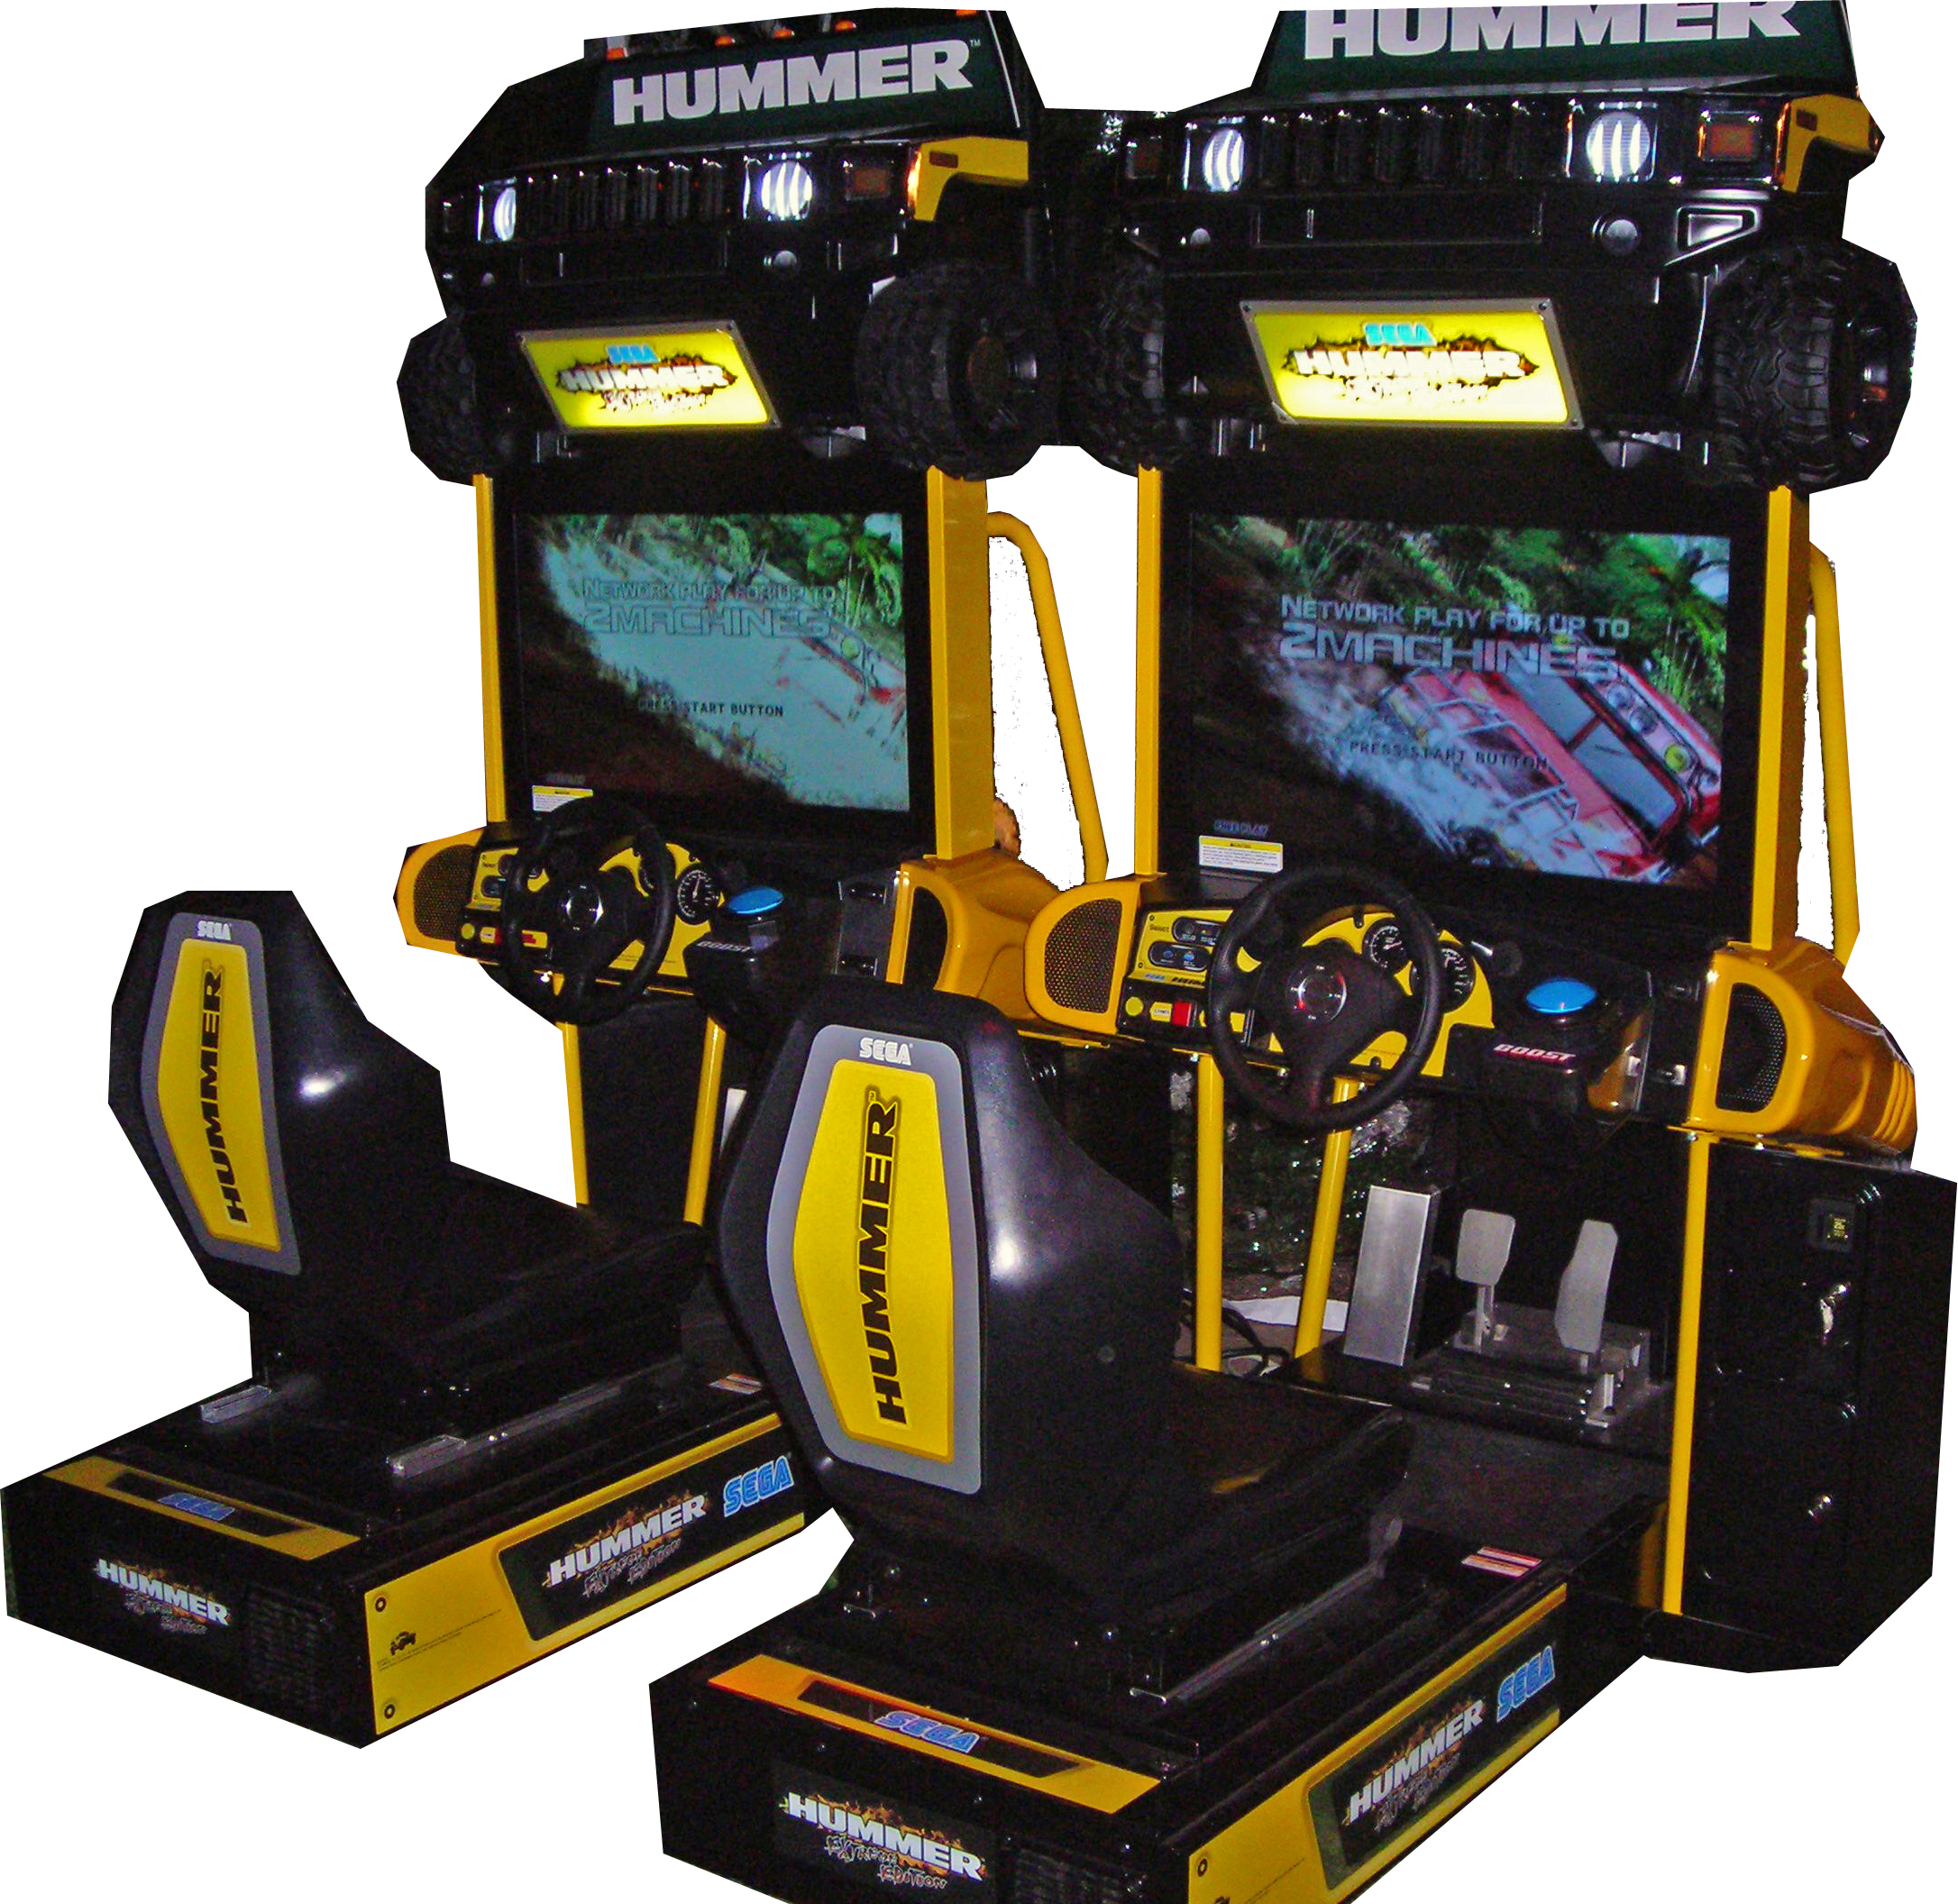 Hummer Xtreme Challenge